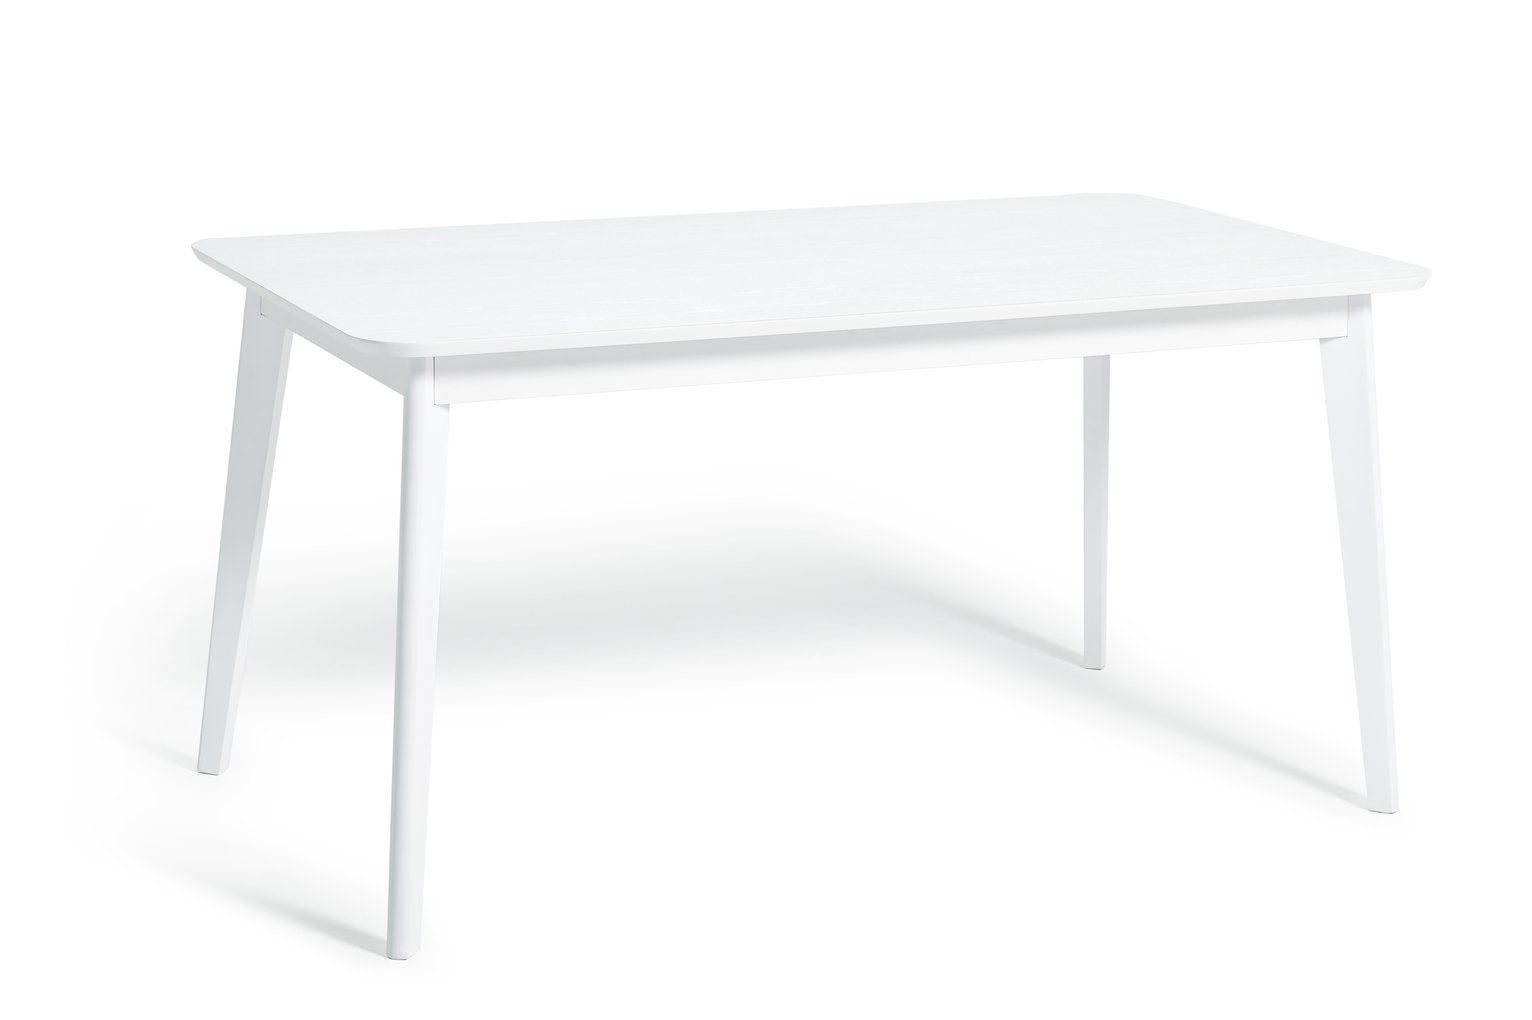 Habitat Skandi Veneer 6 Seater Dining Table - White Oak